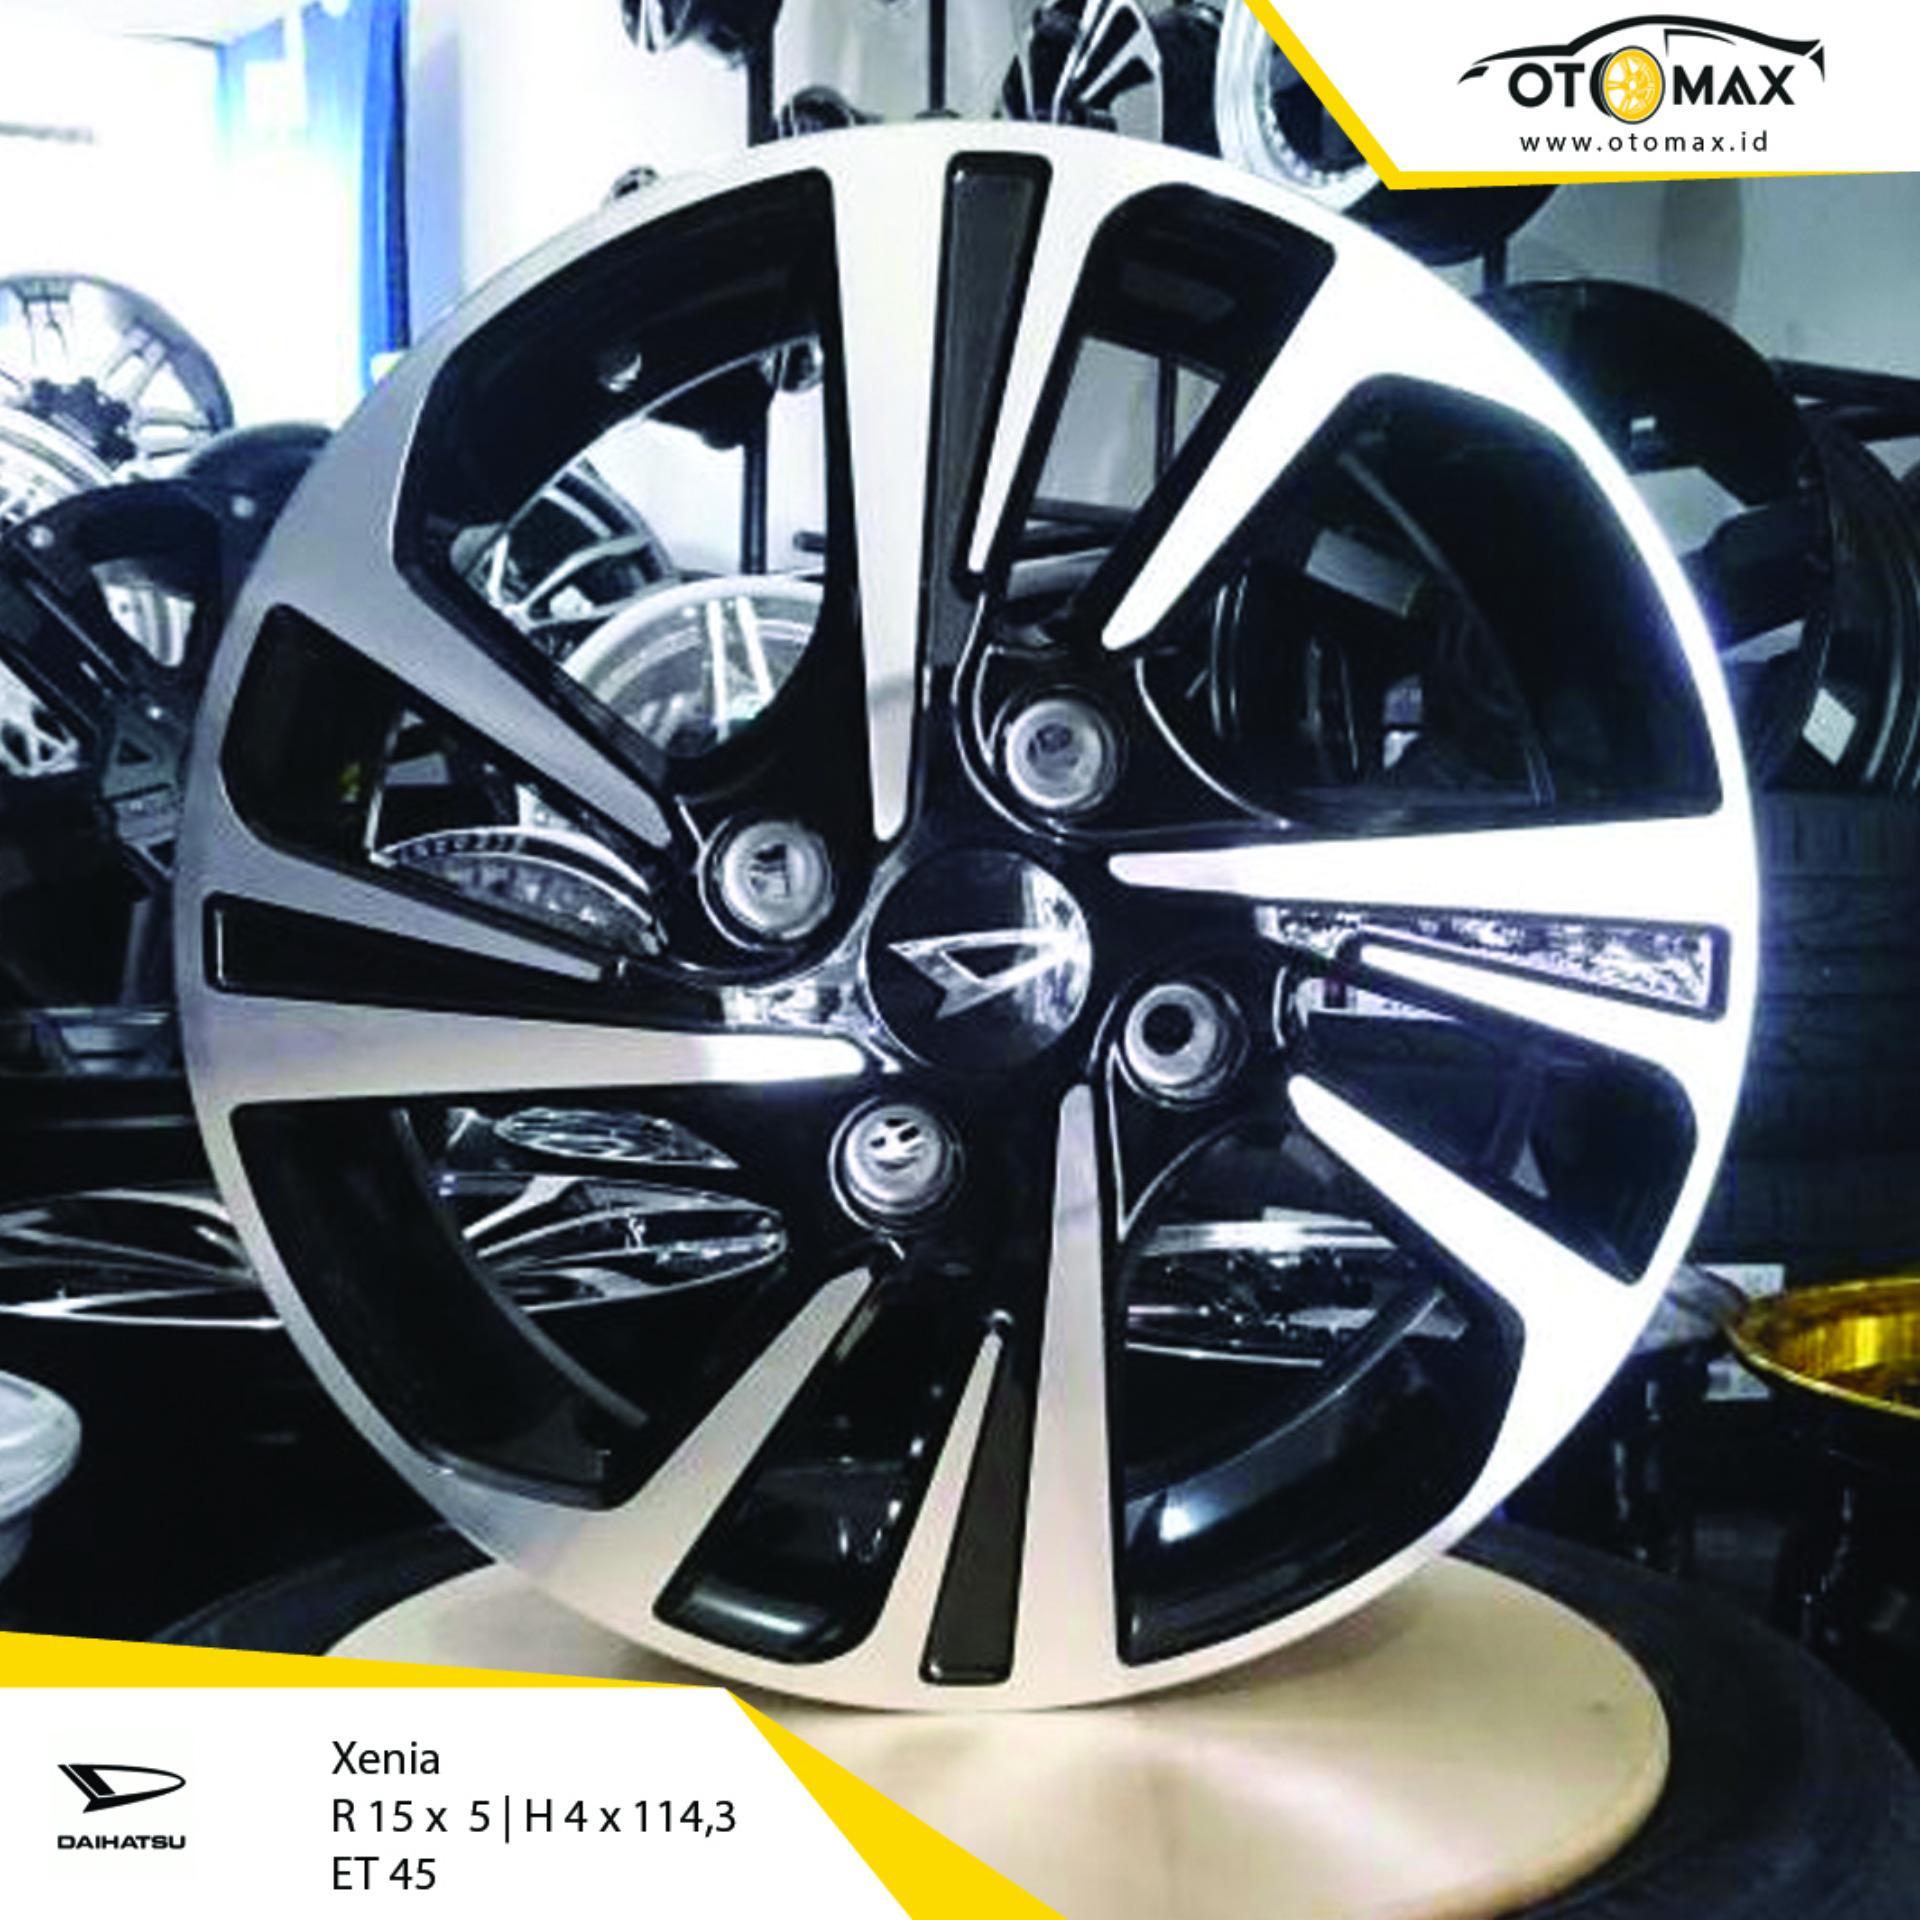 Anggaran Terbaik Velg Mobil Daihatsu Xenia Sporti Ring 15 Daftar Harga Wheel Protector Pelindung List Universal